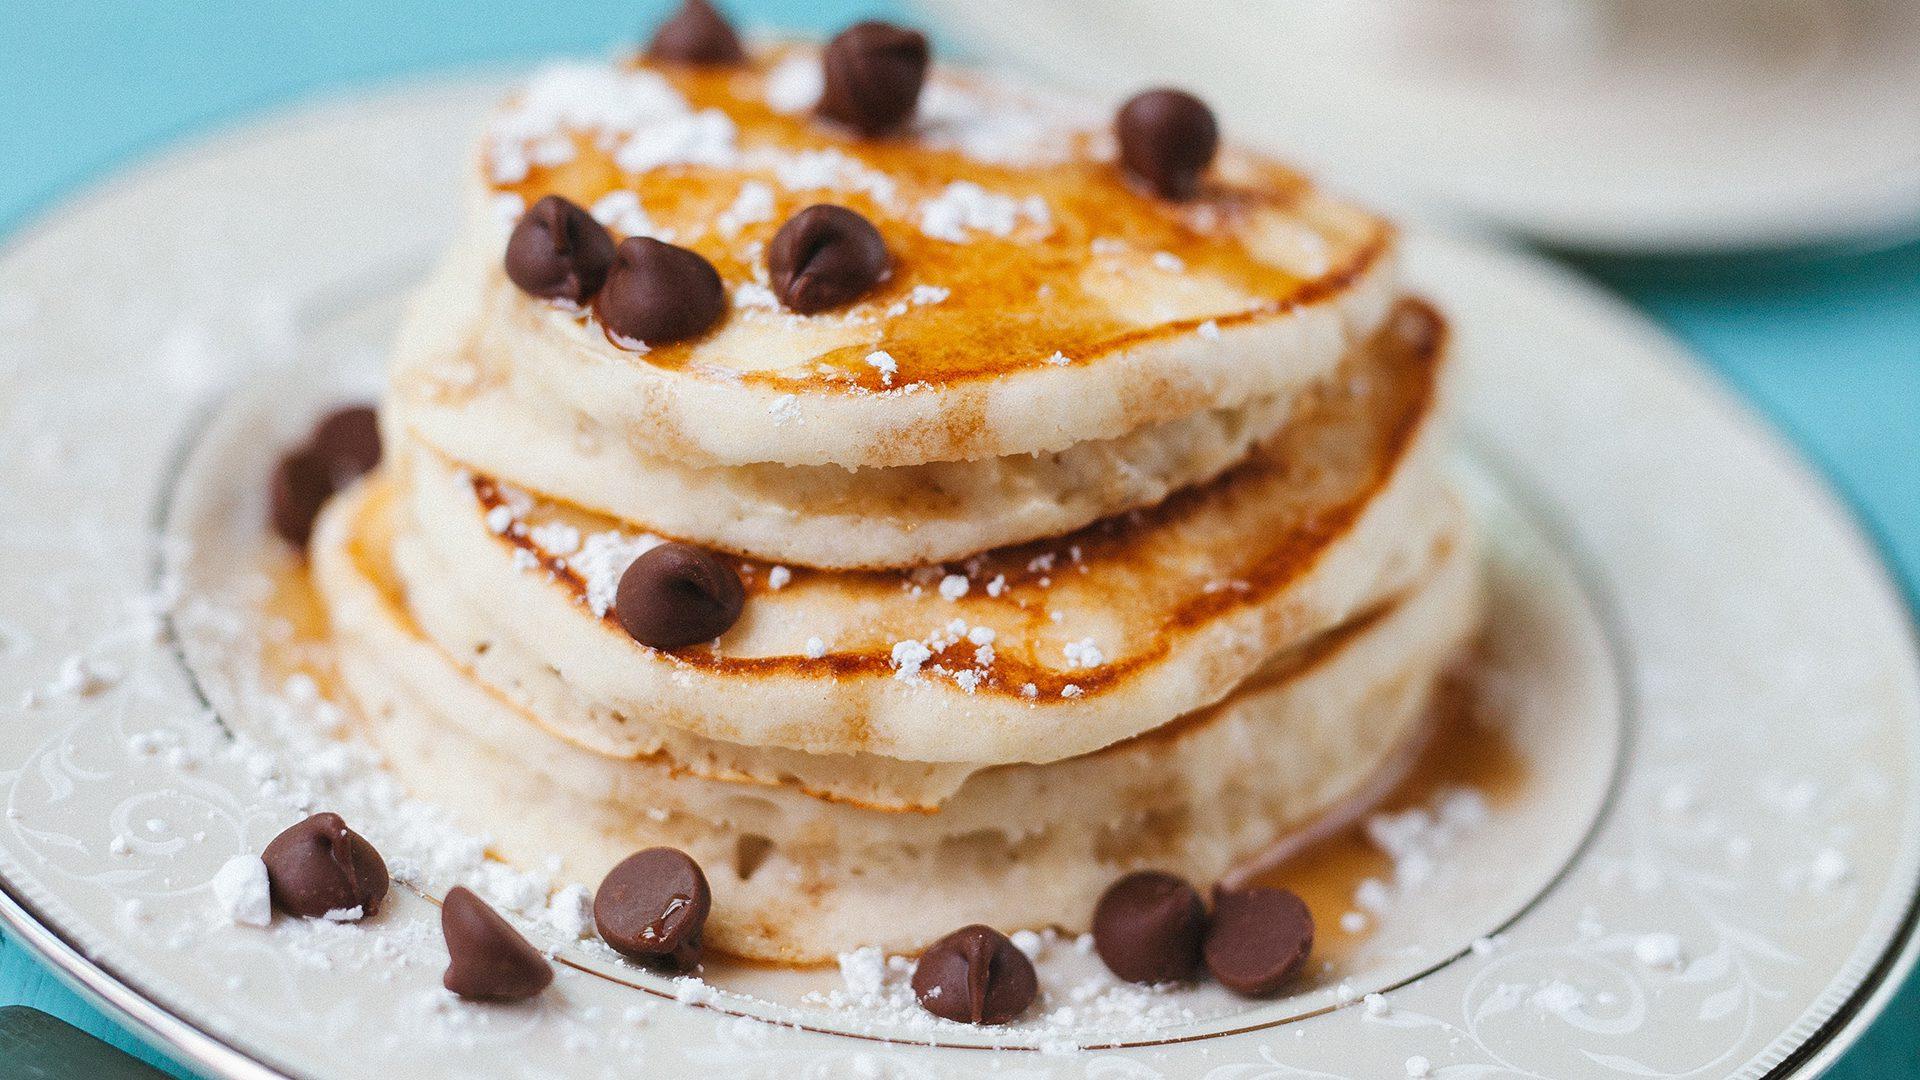 Vegan chocolate chip pancakes recipe featuring fairtrade and organic ingredients on Rosette Fair Trade